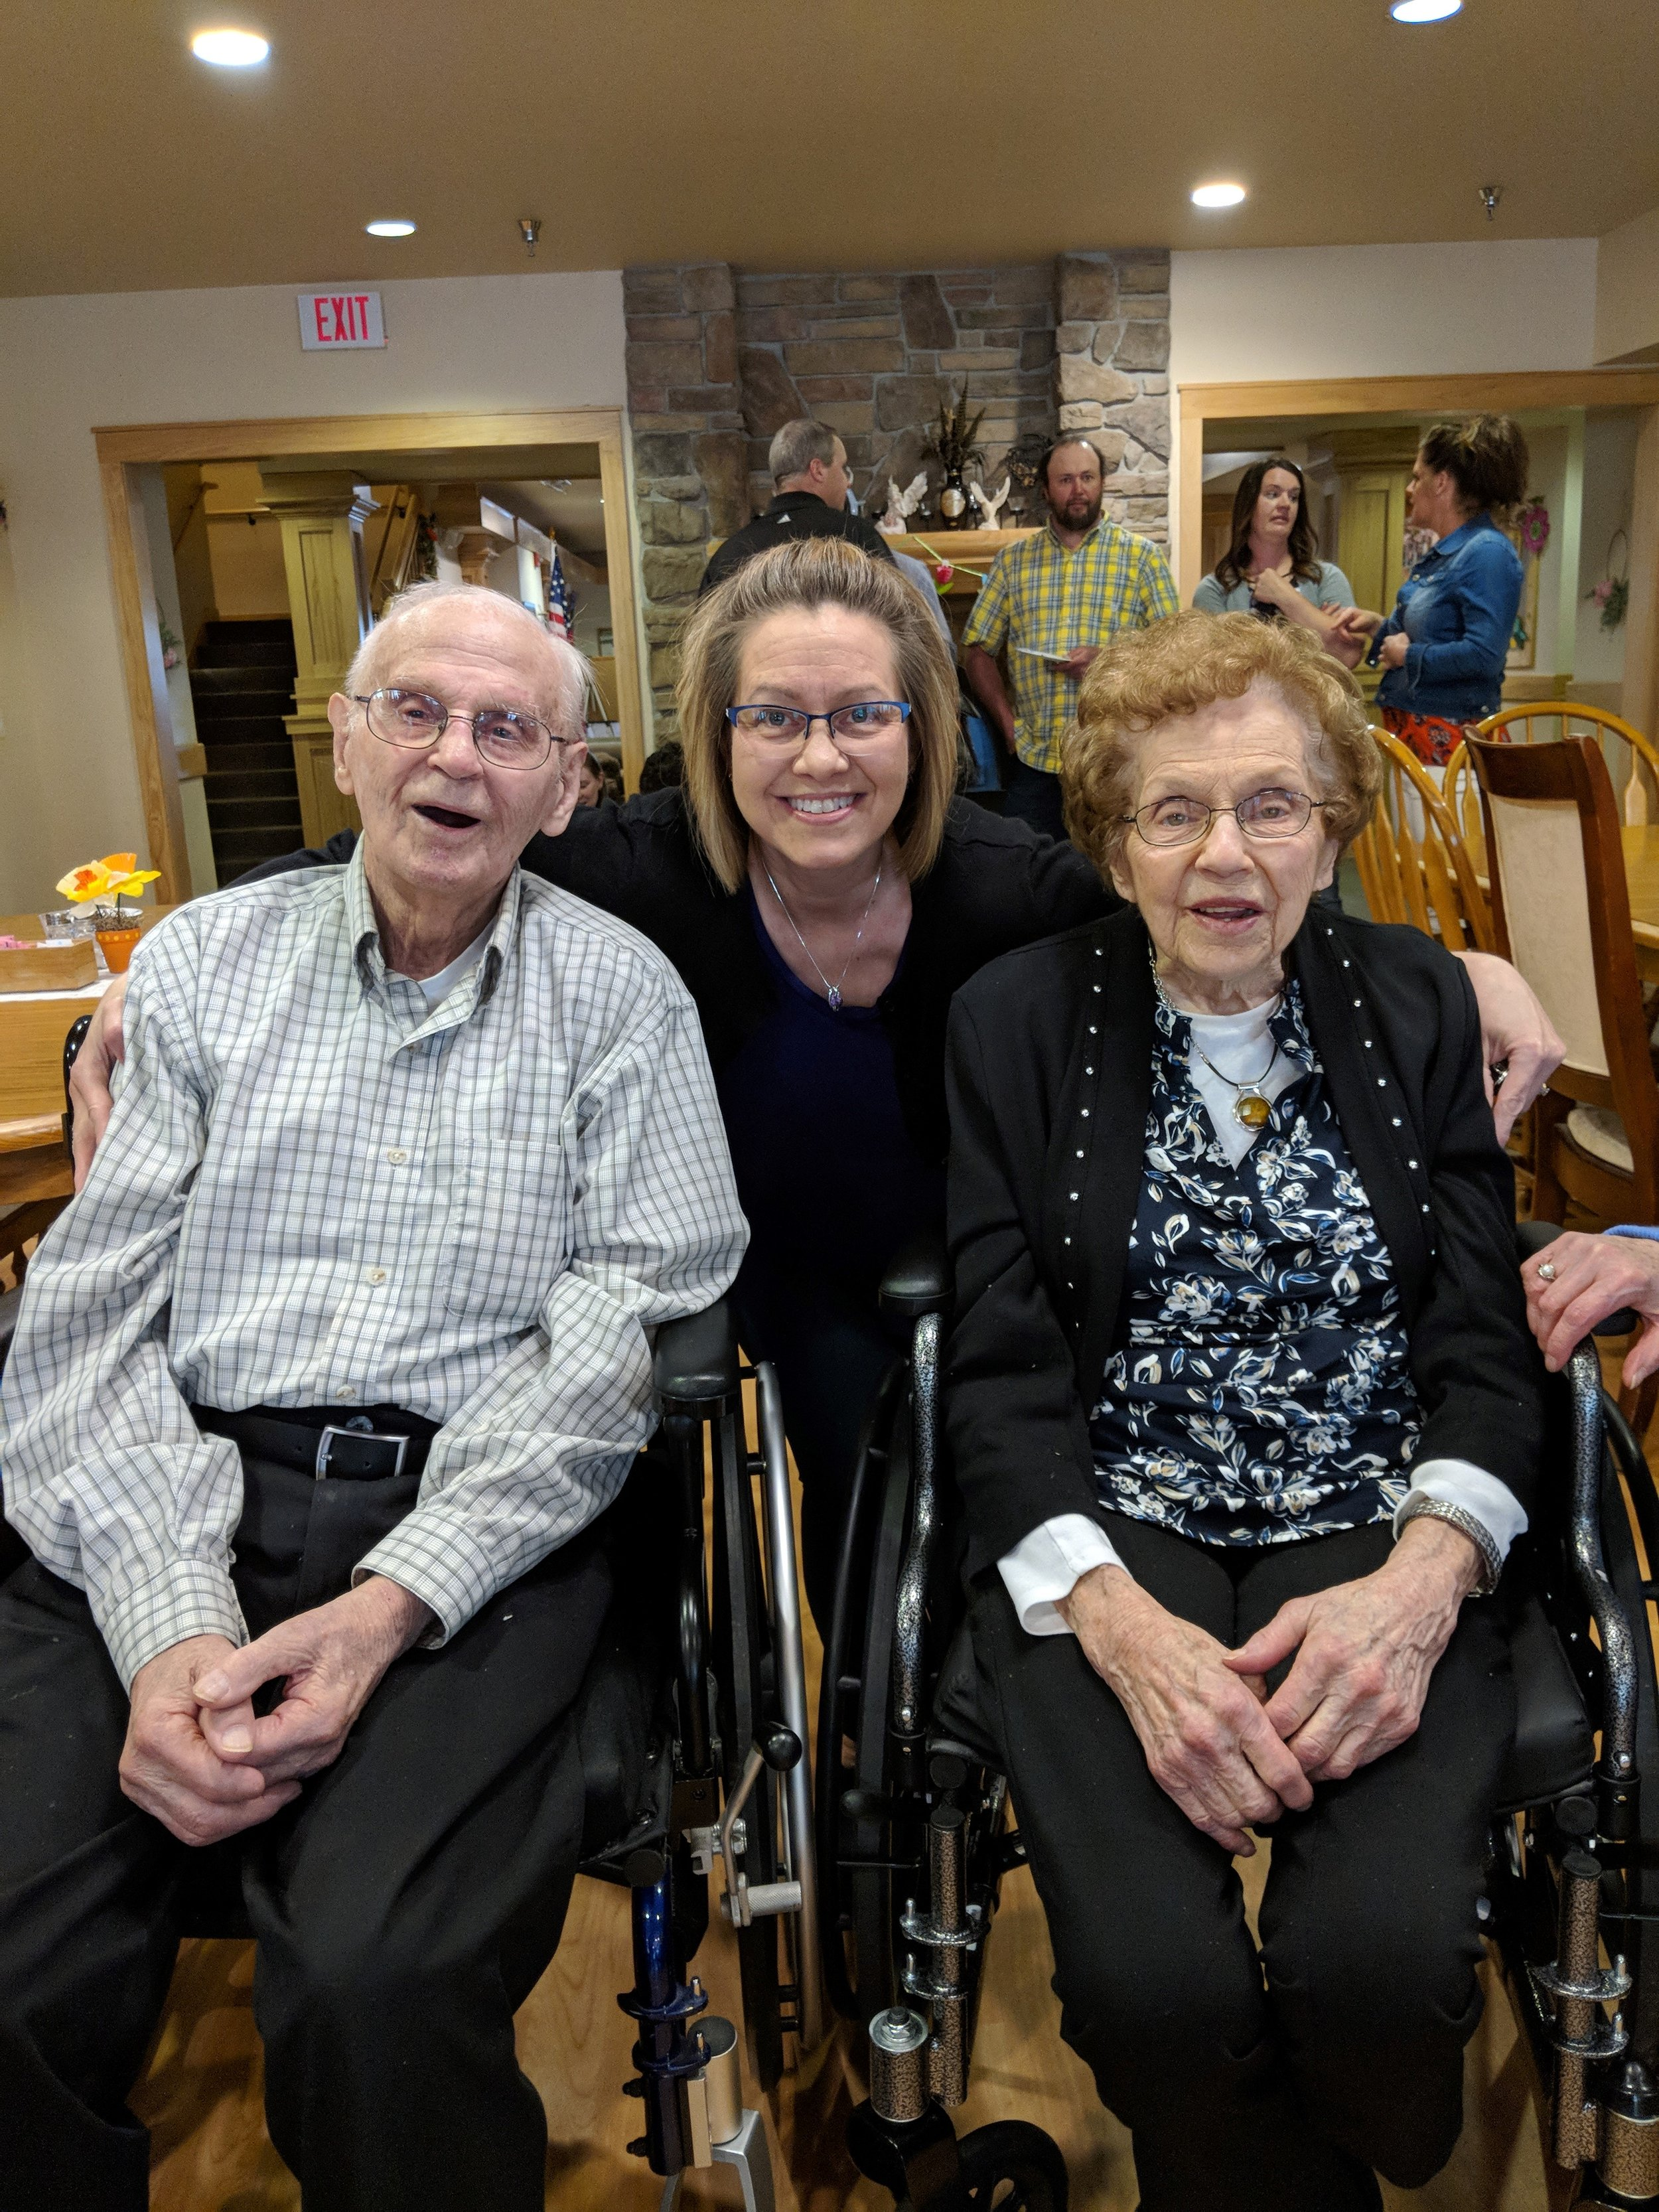 Ray & Bing's 70 wedding anniversary and Bing's 90th birthday celebration! 2.jpg